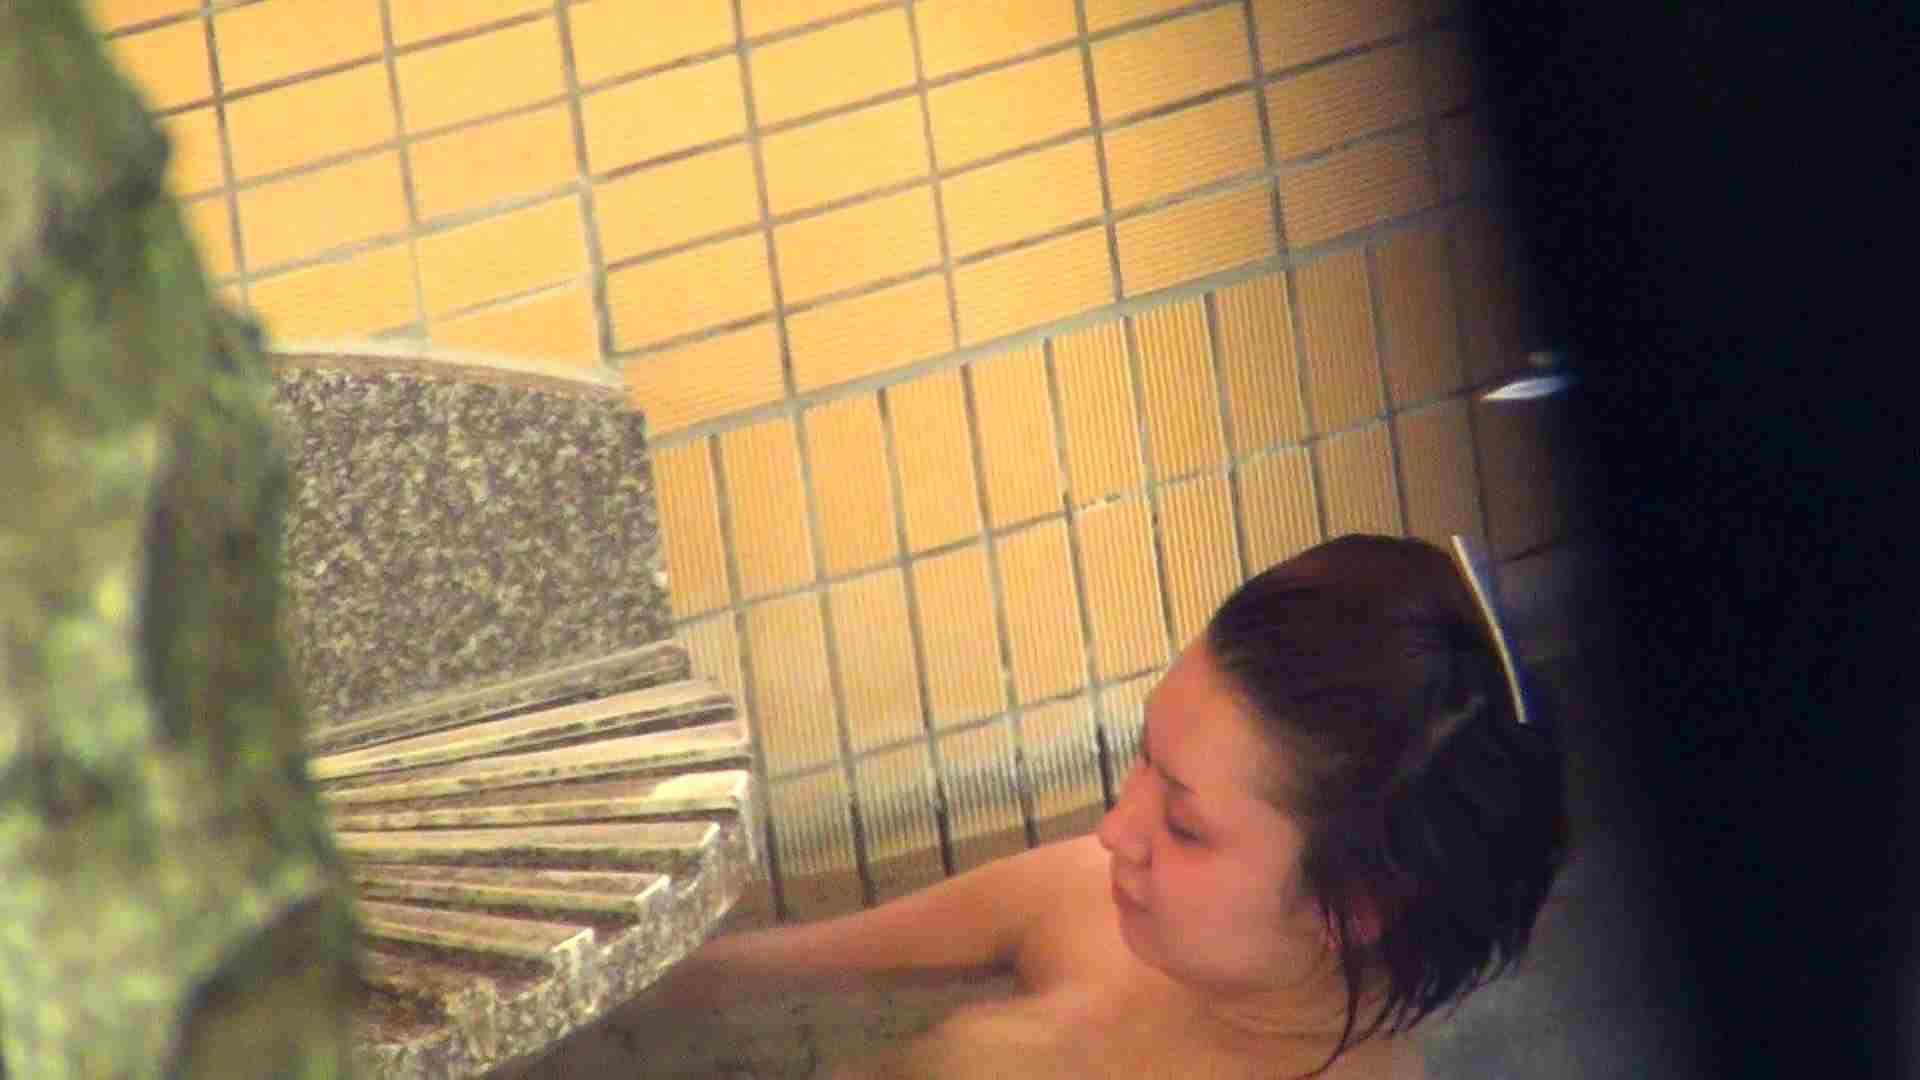 Vol.45 今度はshimaiでしょうか ムッチリ嬢の大胆開脚 潜伏露天風呂 盗撮アダルト動画キャプチャ 99pic 98